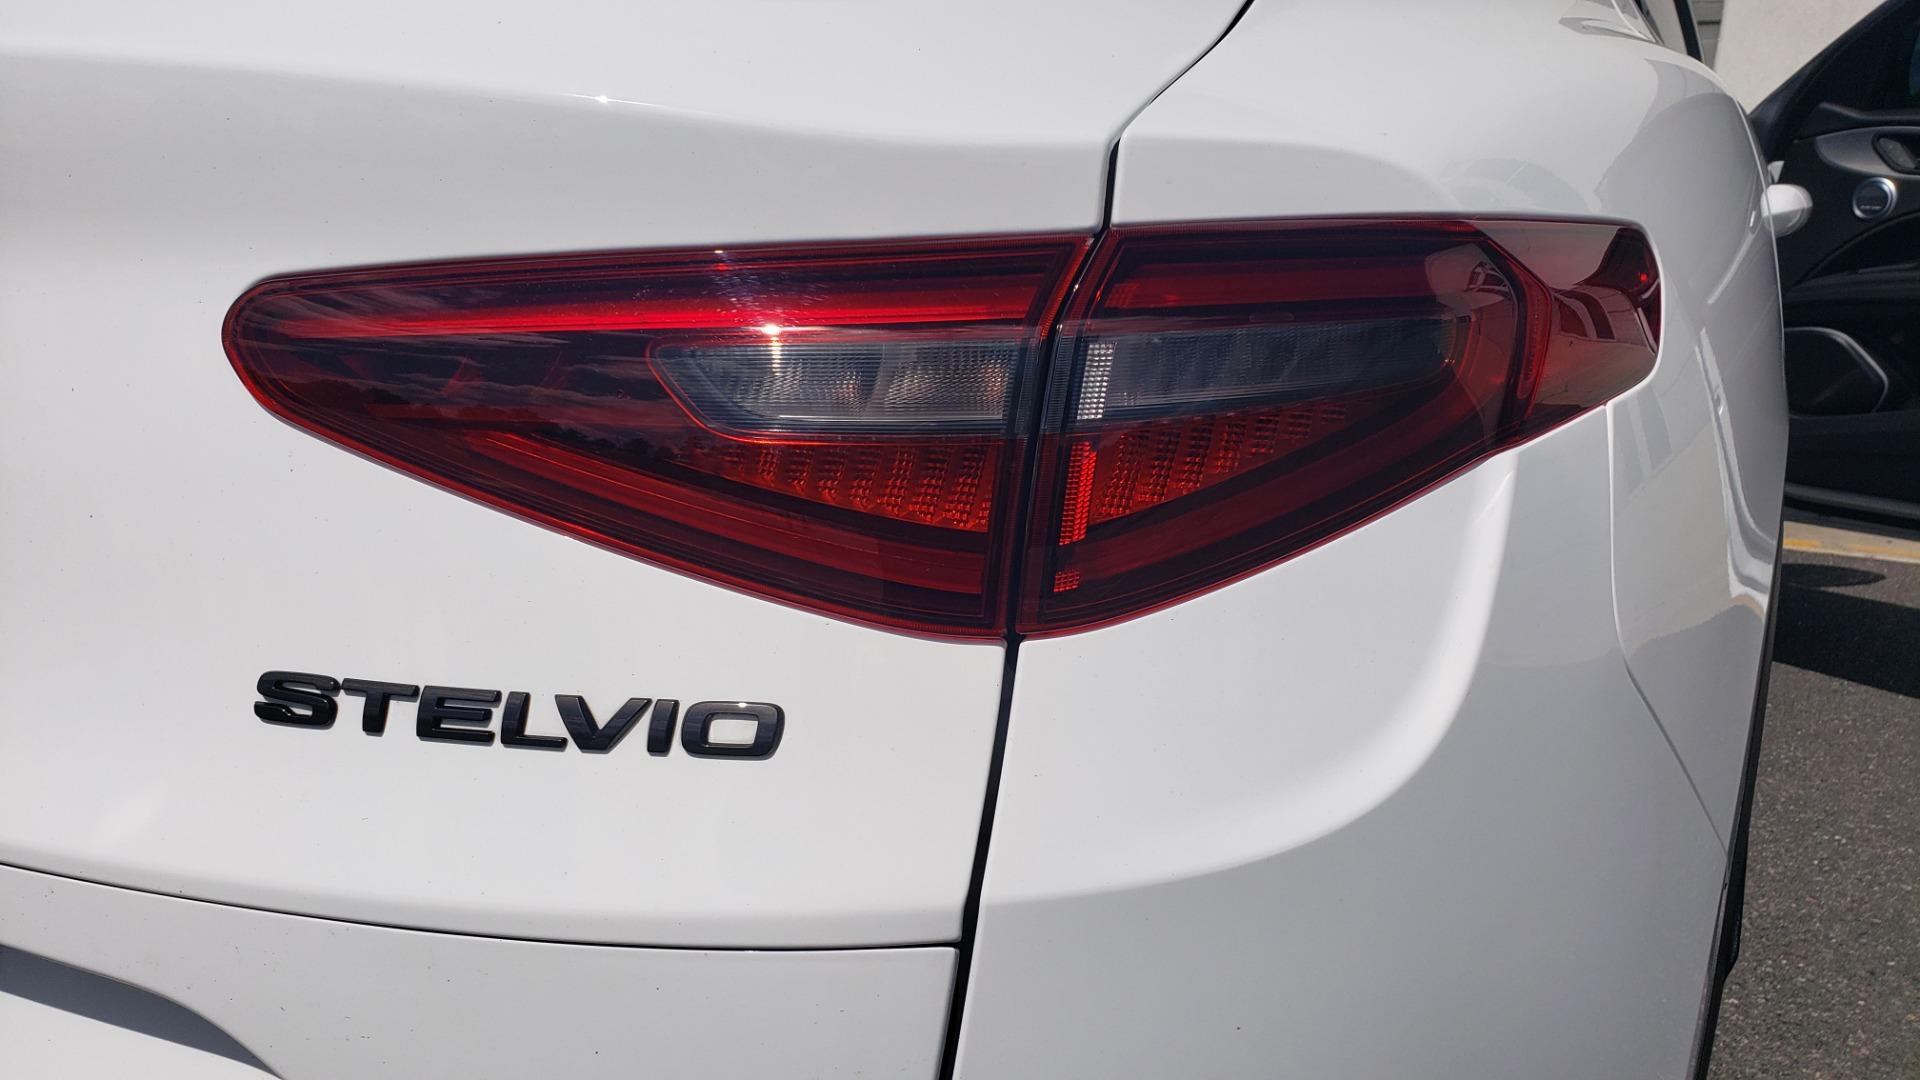 Used 2019 Alfa Romeo STELVIO TI SPORT AWD / 2.0L TURBO / 8-SPD AUTO / DRVR ASST / REARVIEW for sale $37,495 at Formula Imports in Charlotte NC 28227 34